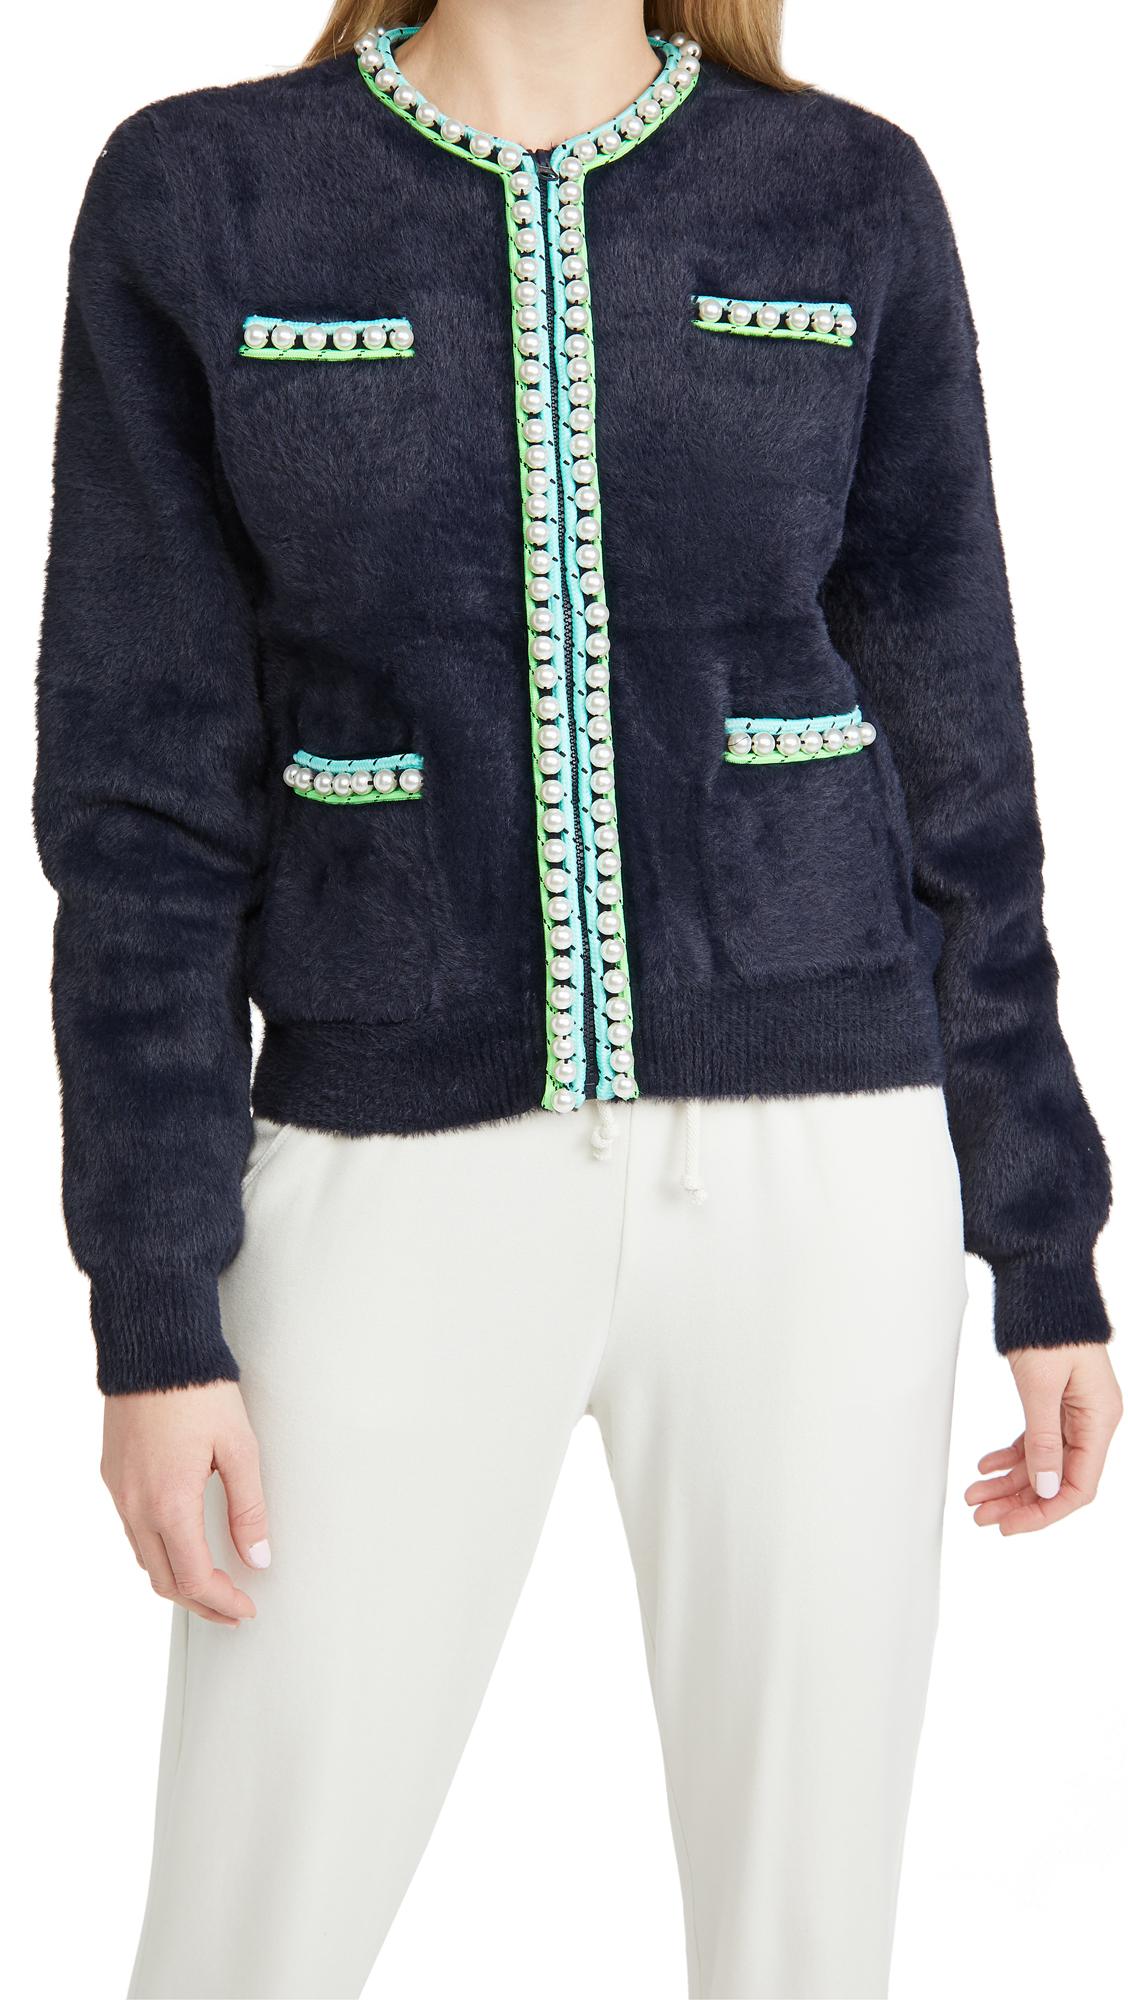 Essentiel Antwerp Wirl Knit Imitation Pearls Cardigan